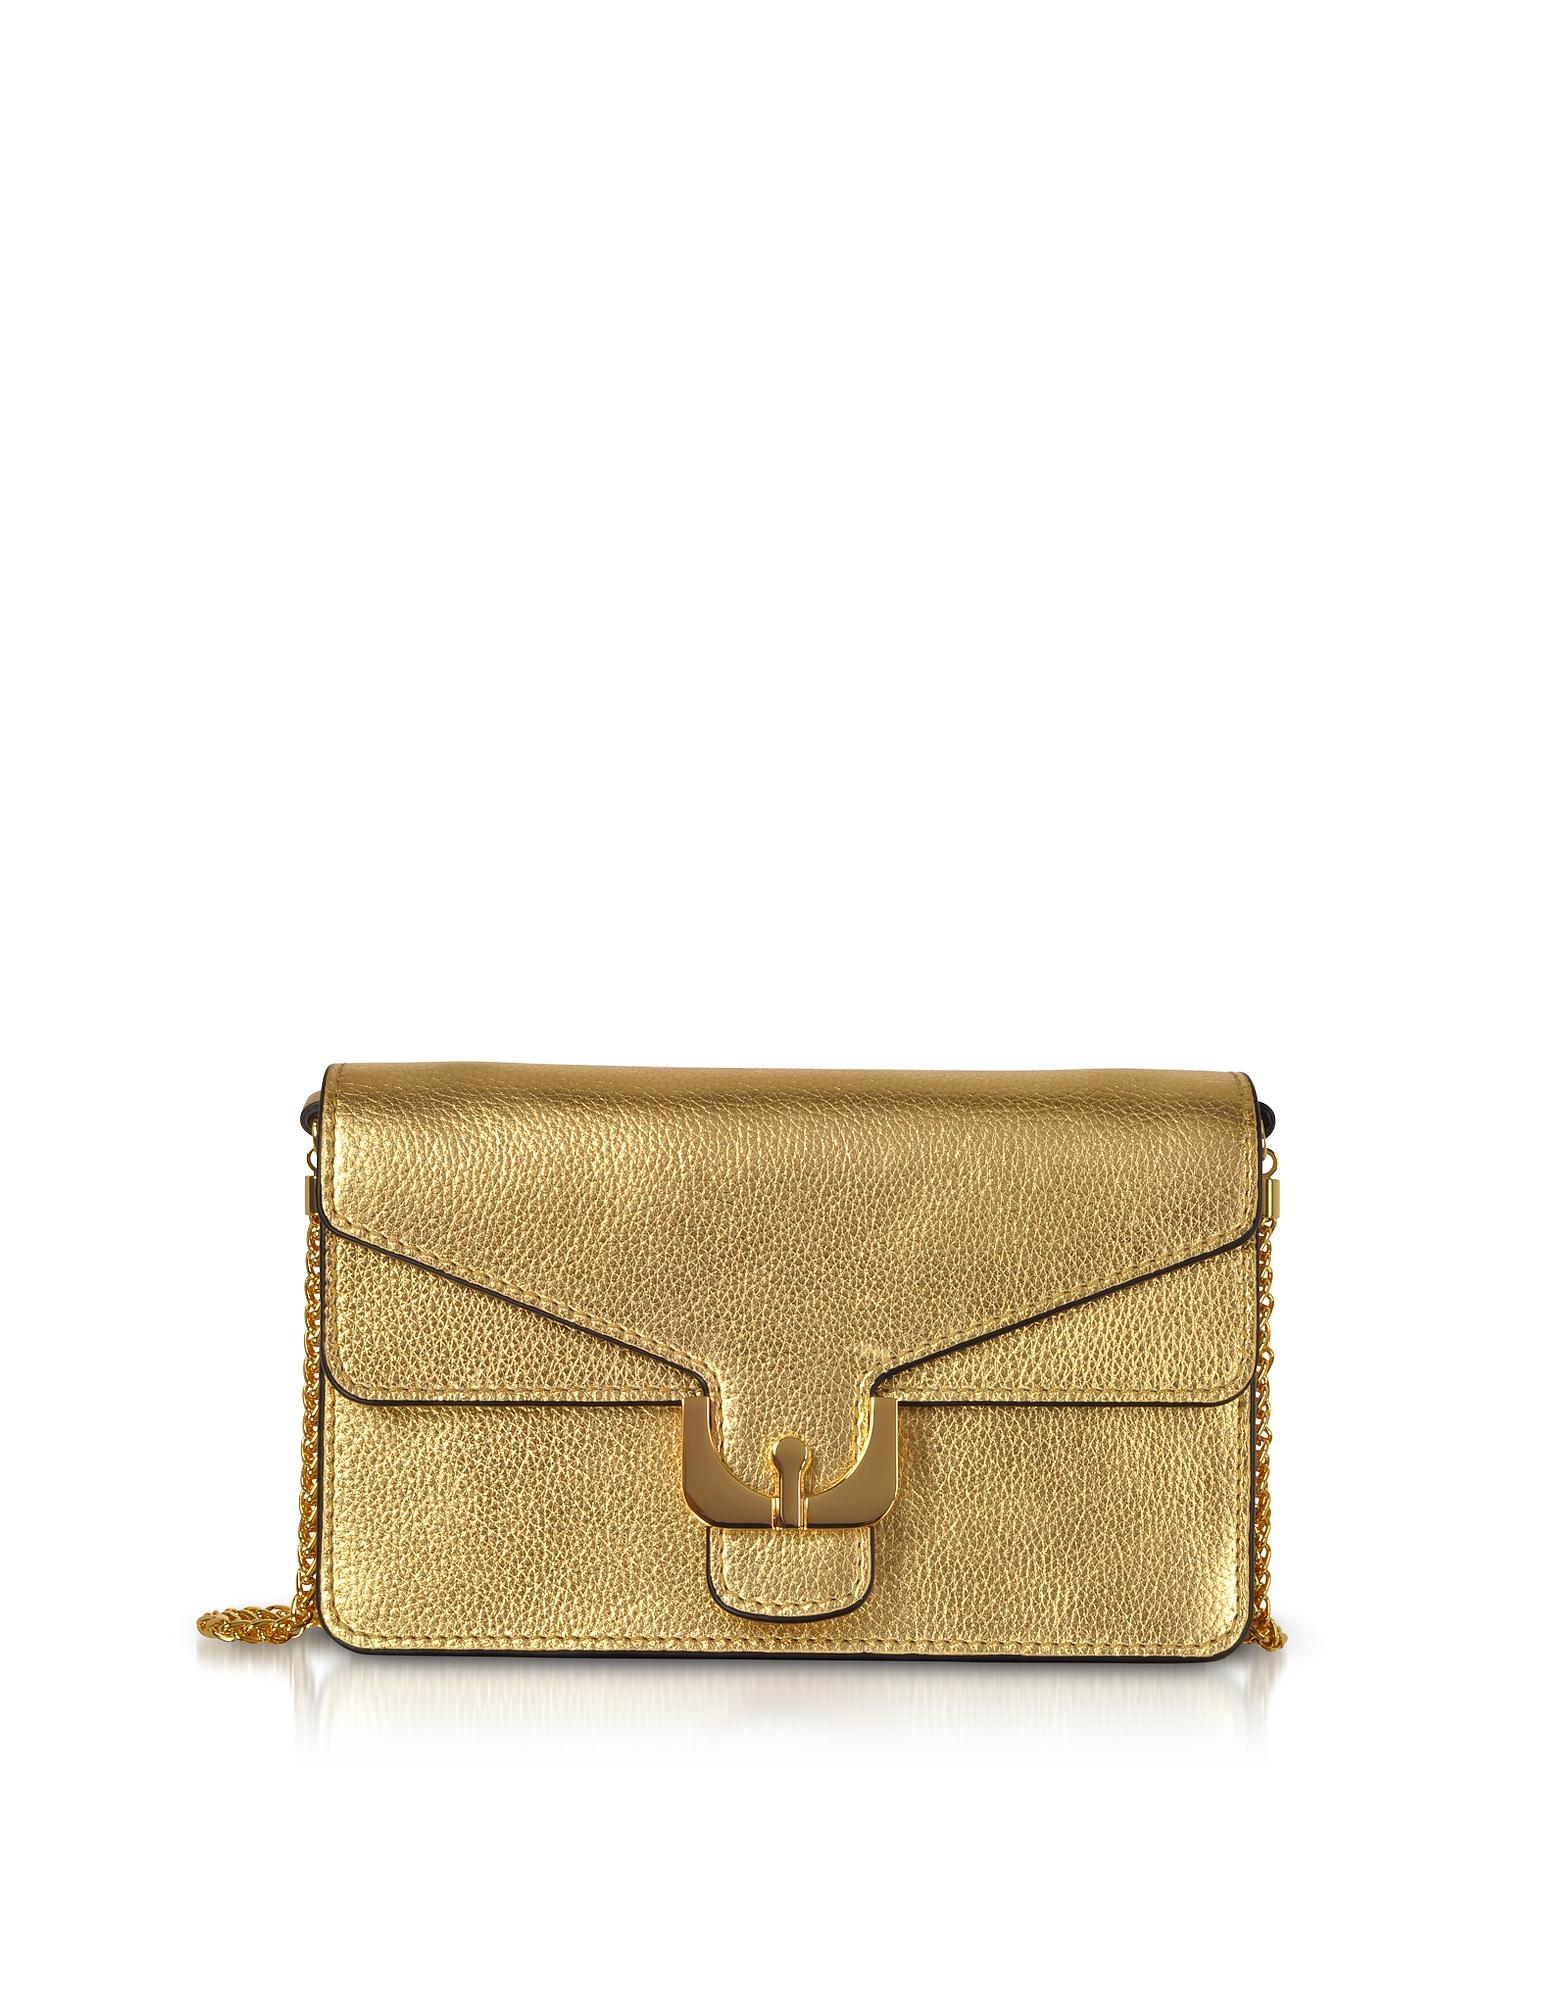 Ambrine Soft Grained Leather Crossbody Bag